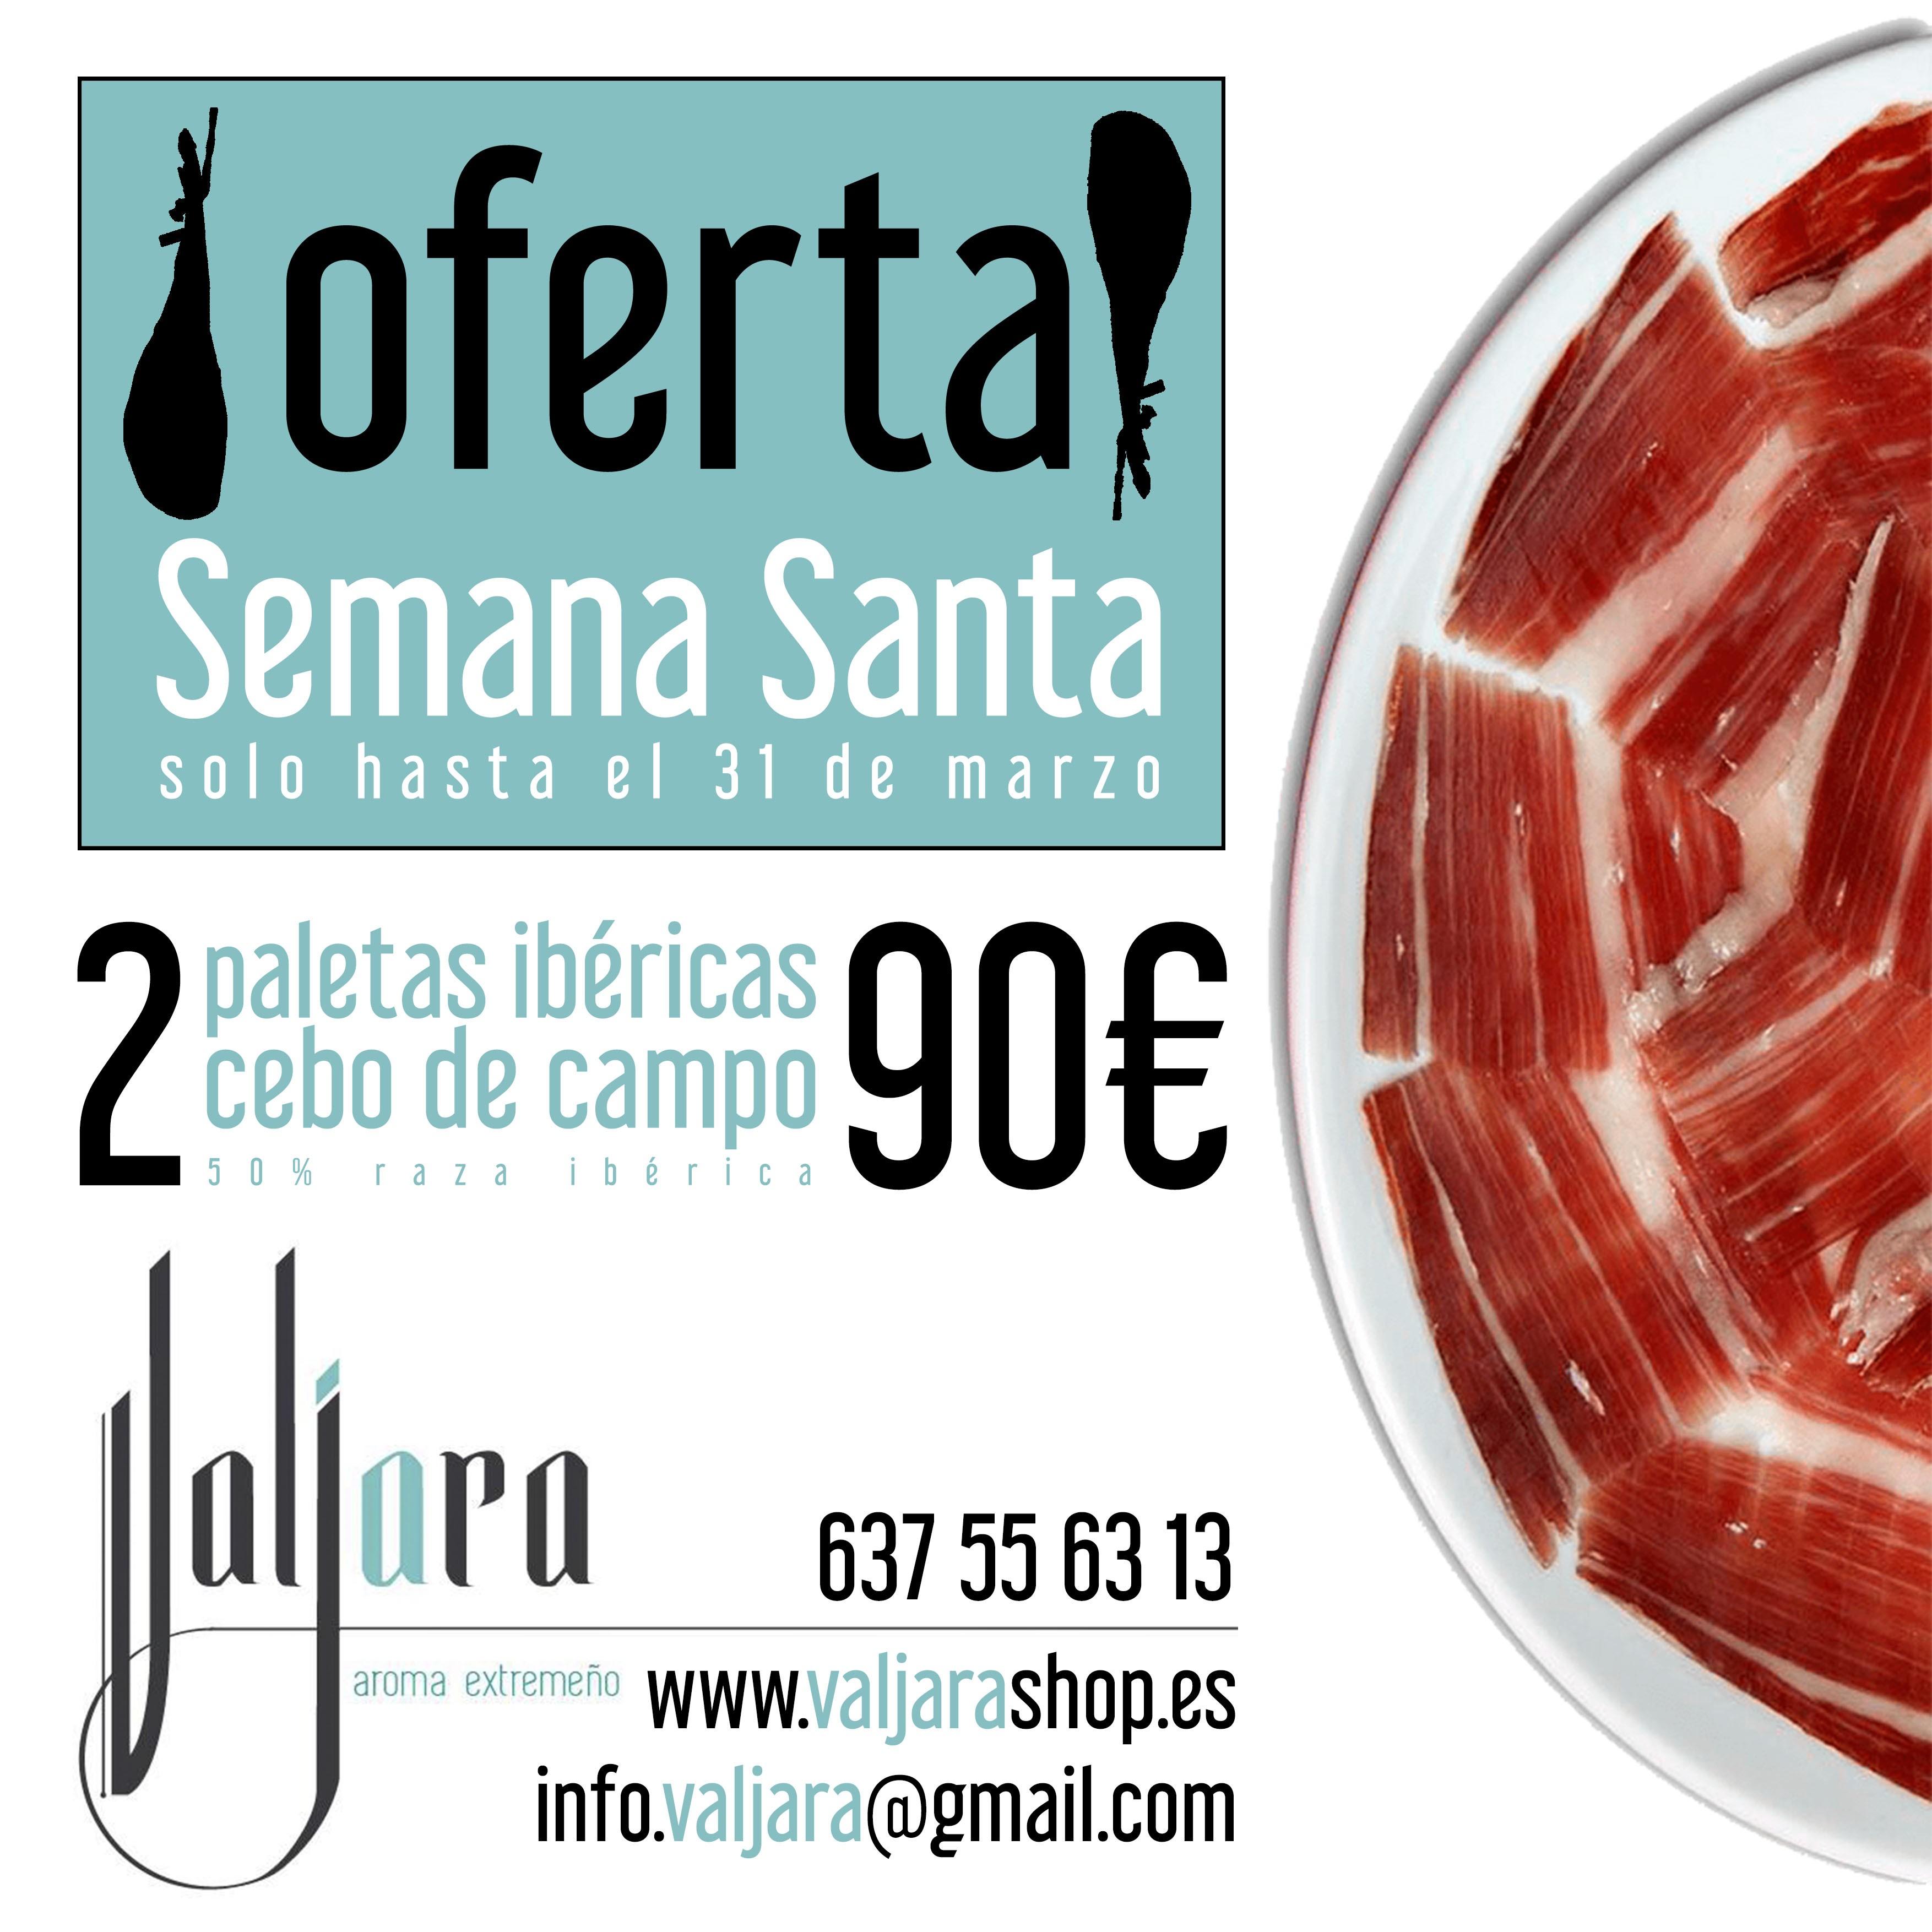 2 Paletas de Cebo de Campo Extremadura 90€